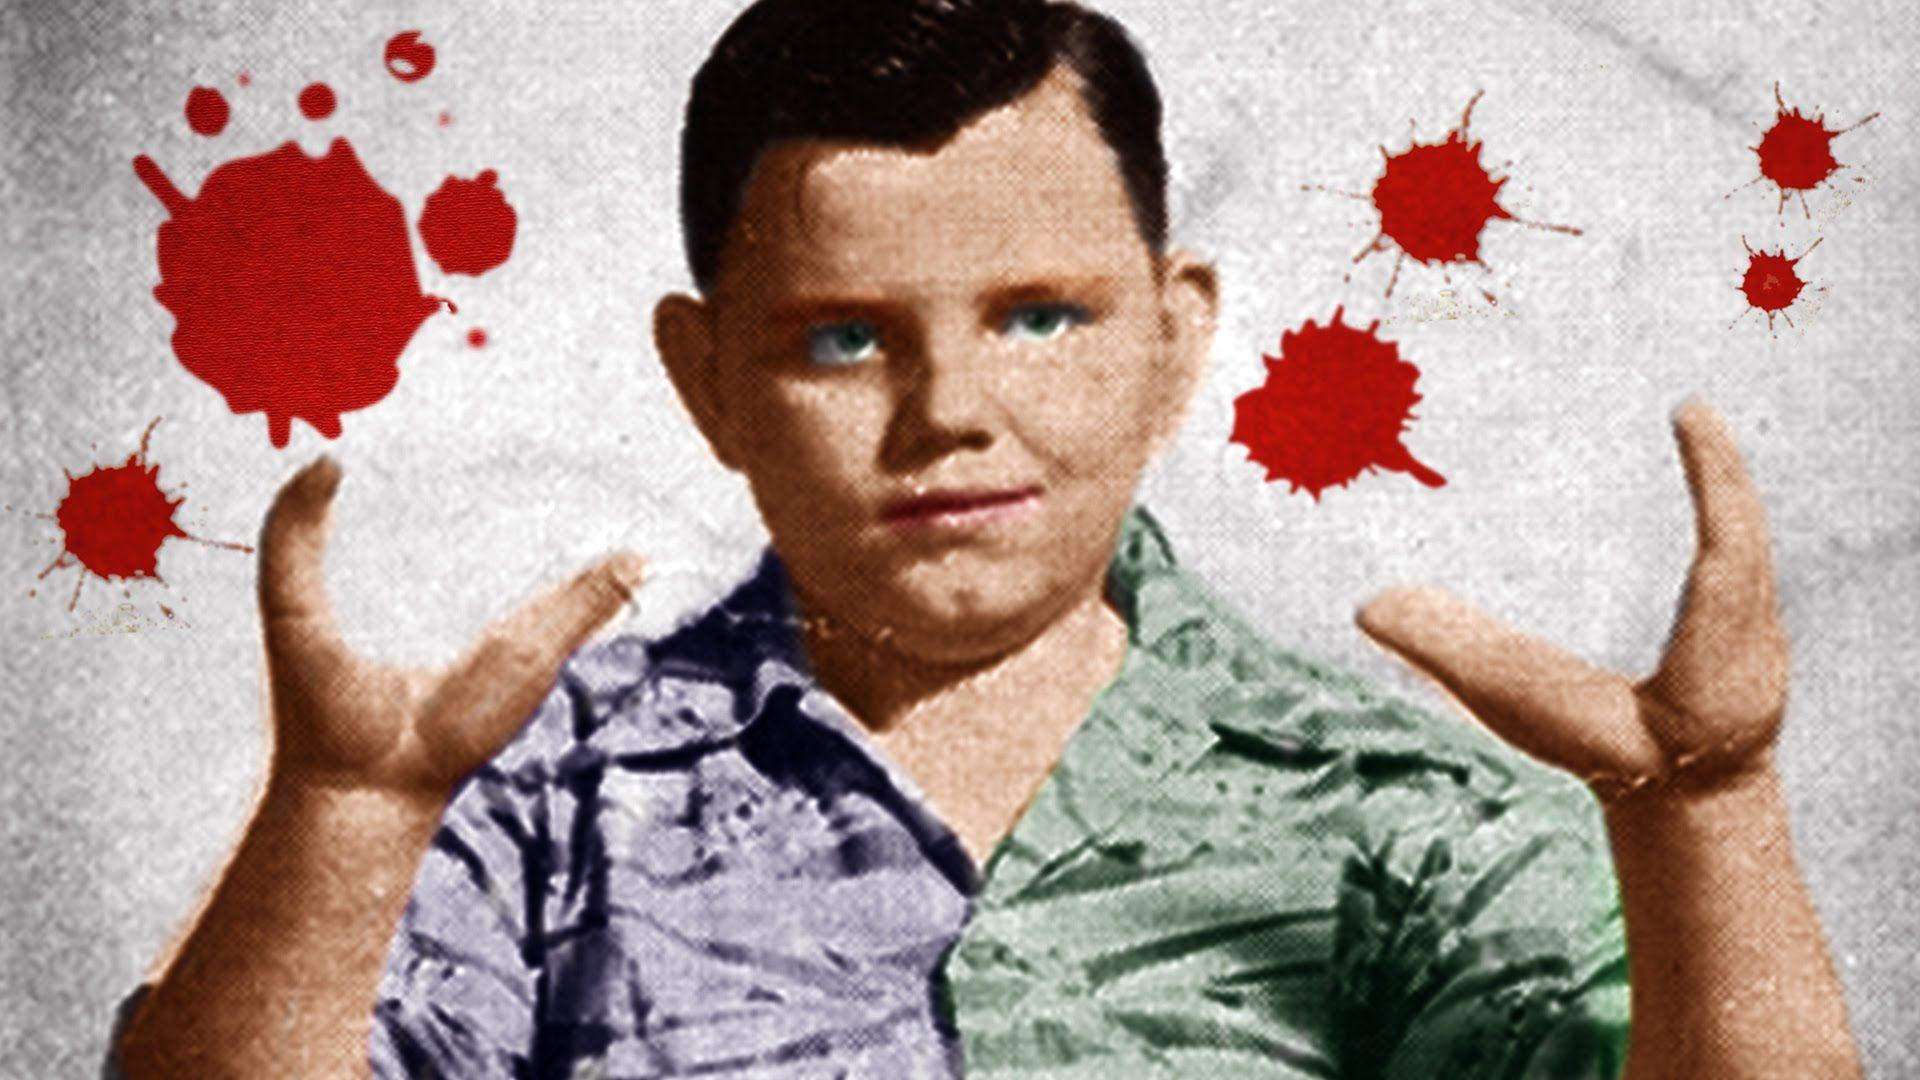 The Killer Lobster Boy Grady Stiles Anatomy Of Murder 4 Scary